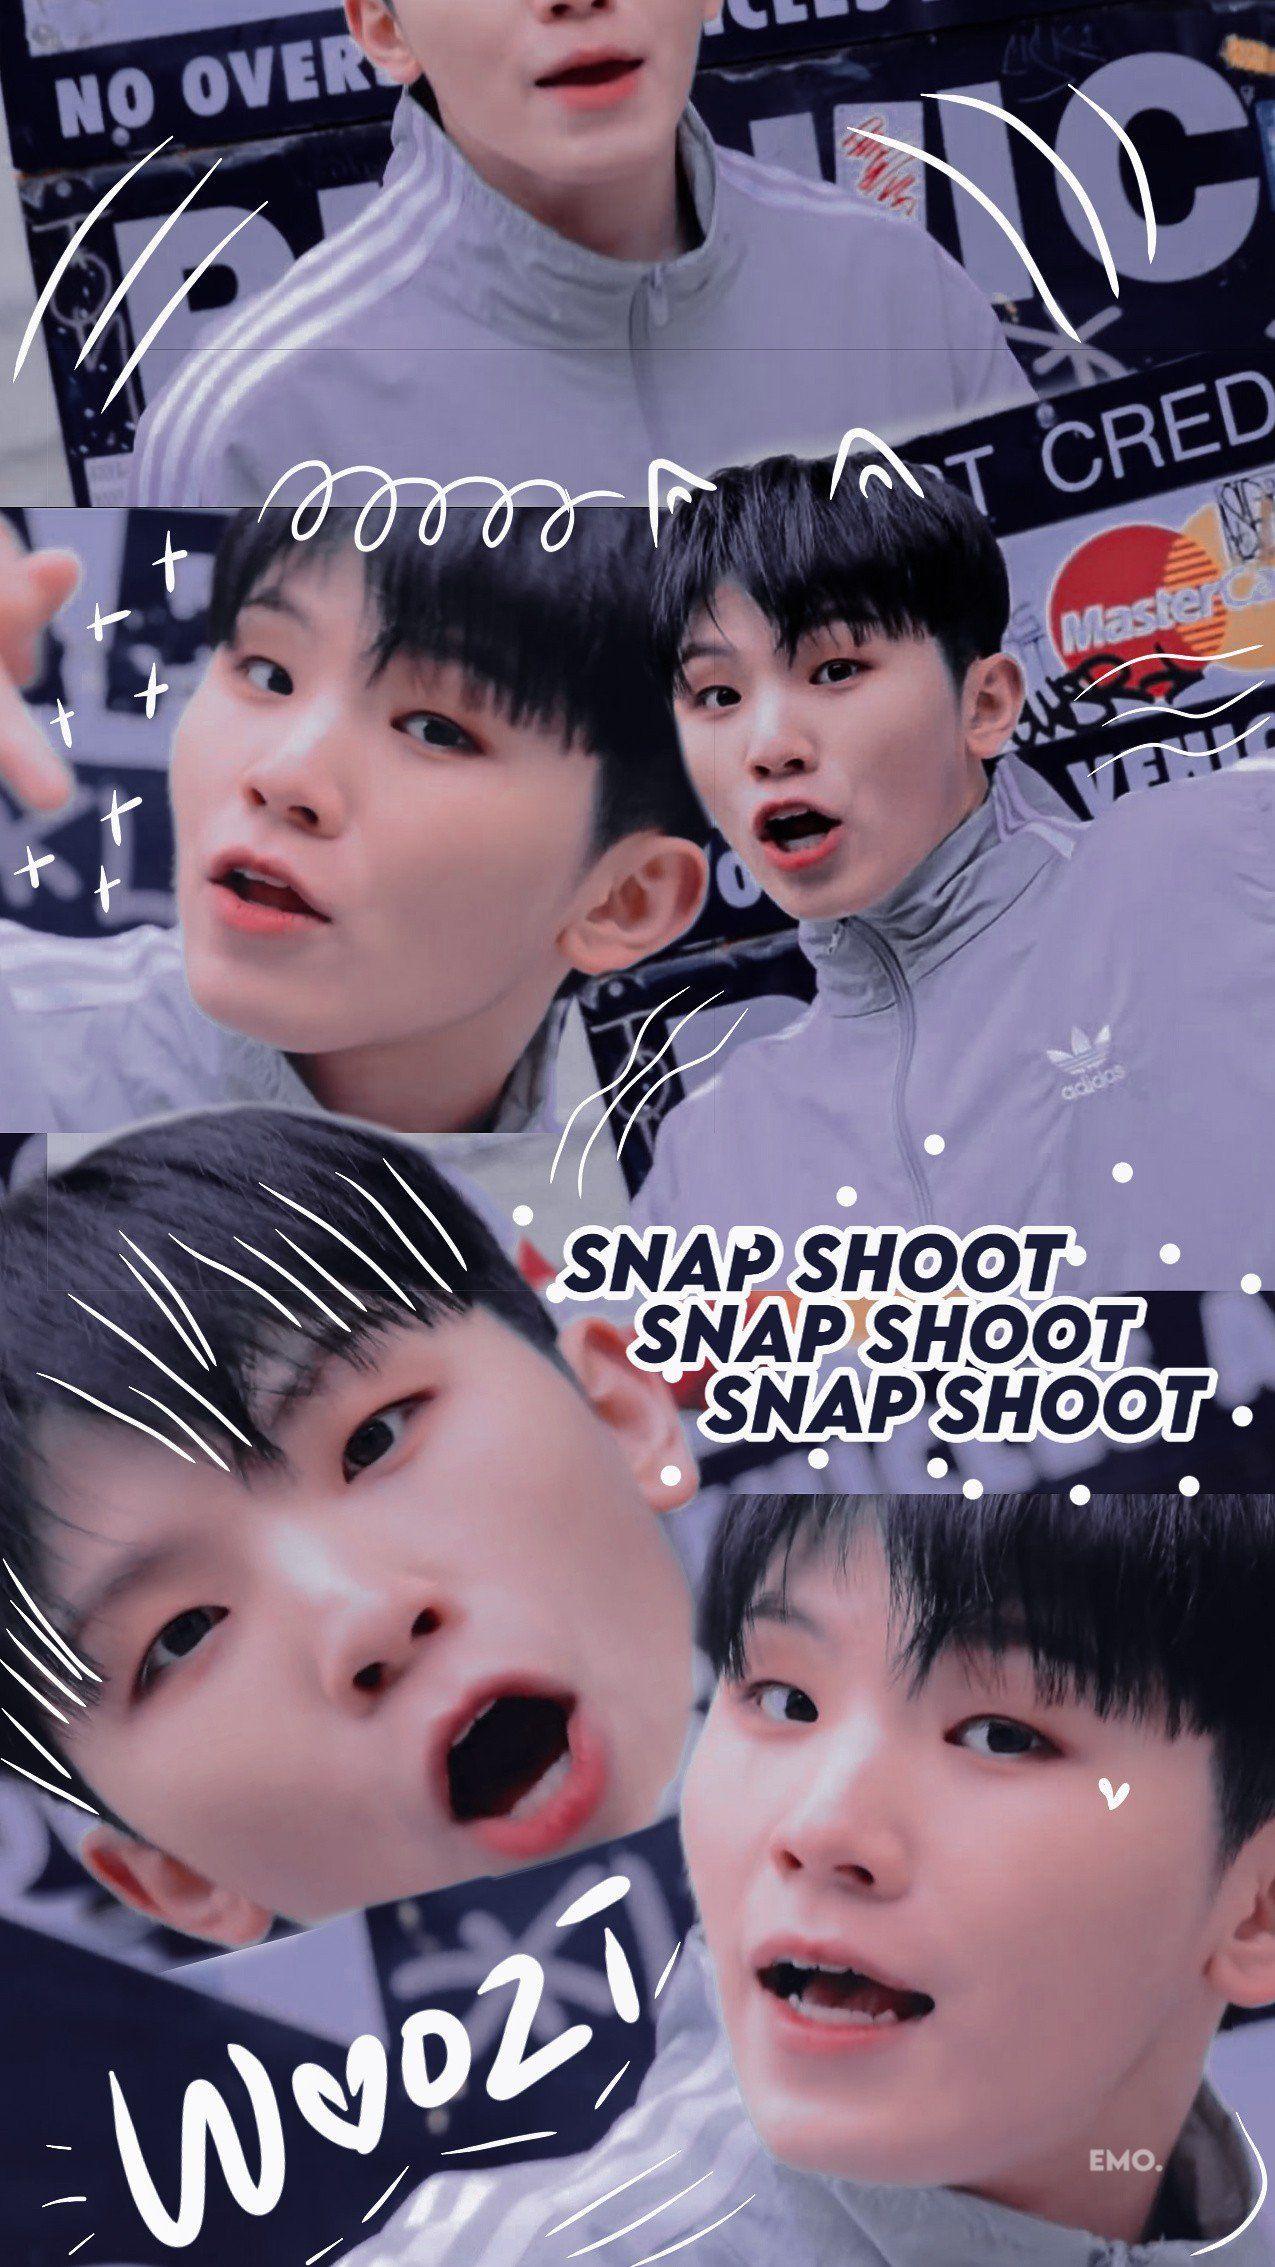 Seventeen Aesthetic Snap shoot Special Video Wallpaper lockscreen ©️bucinyameanie.  Follow her on twitter💗 #snapshoot #seventeenwallpaper #seventeen #woozi #jihoon #우지 #지훈 #세븐틴 #sebong #セブチ #ウジ #李知勳